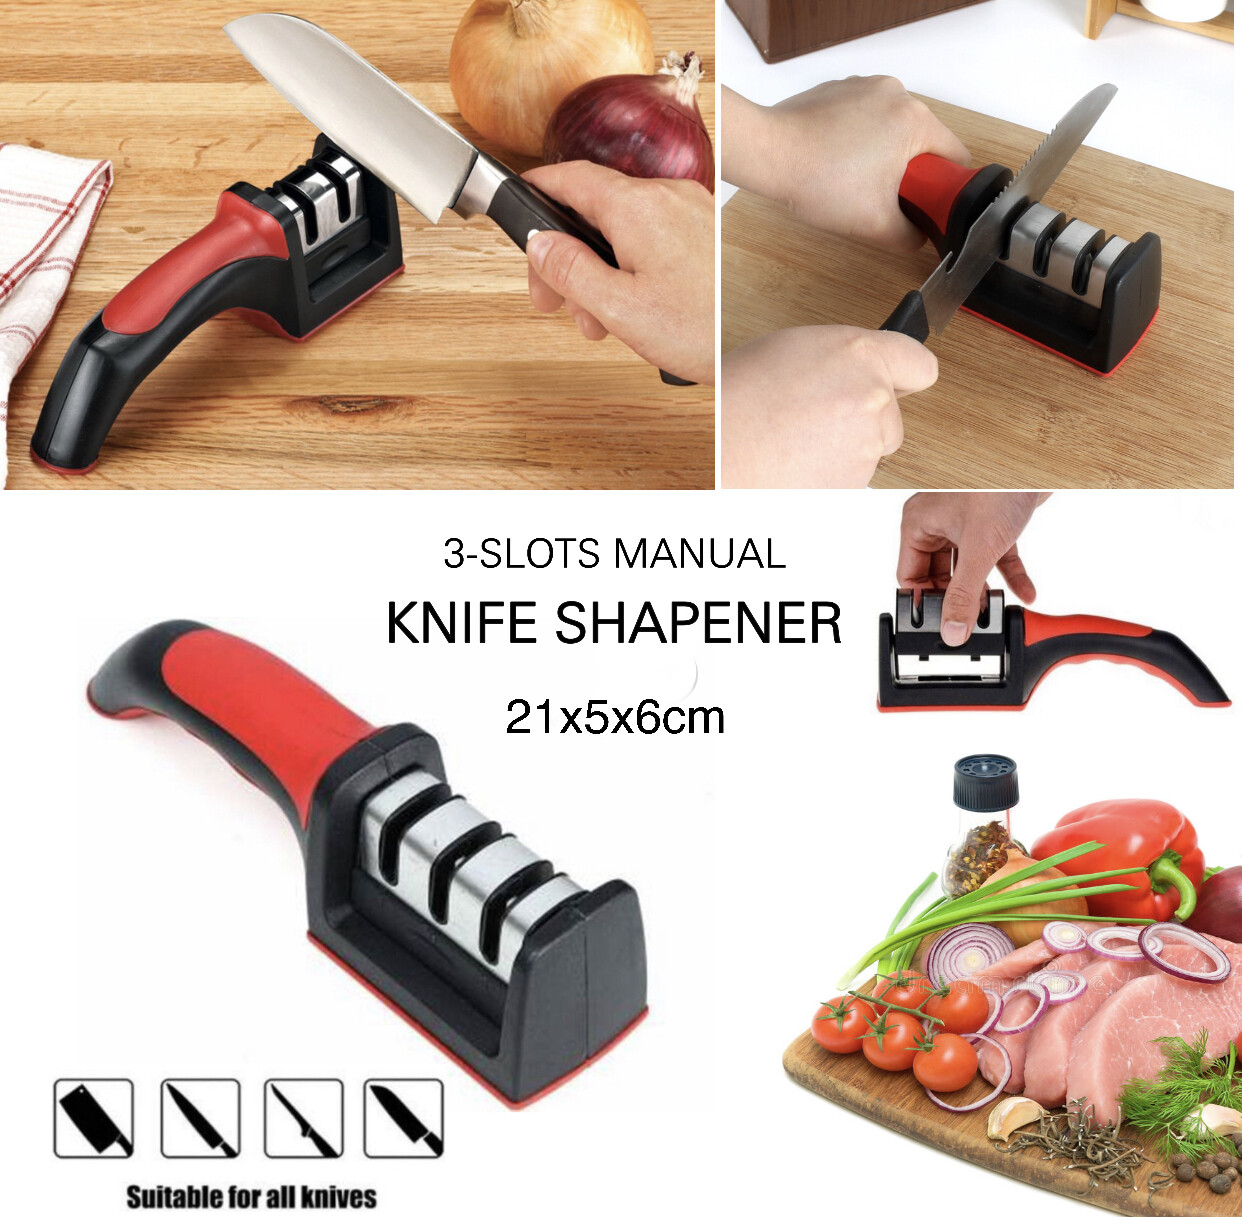 3-Slots Knife Sharpener